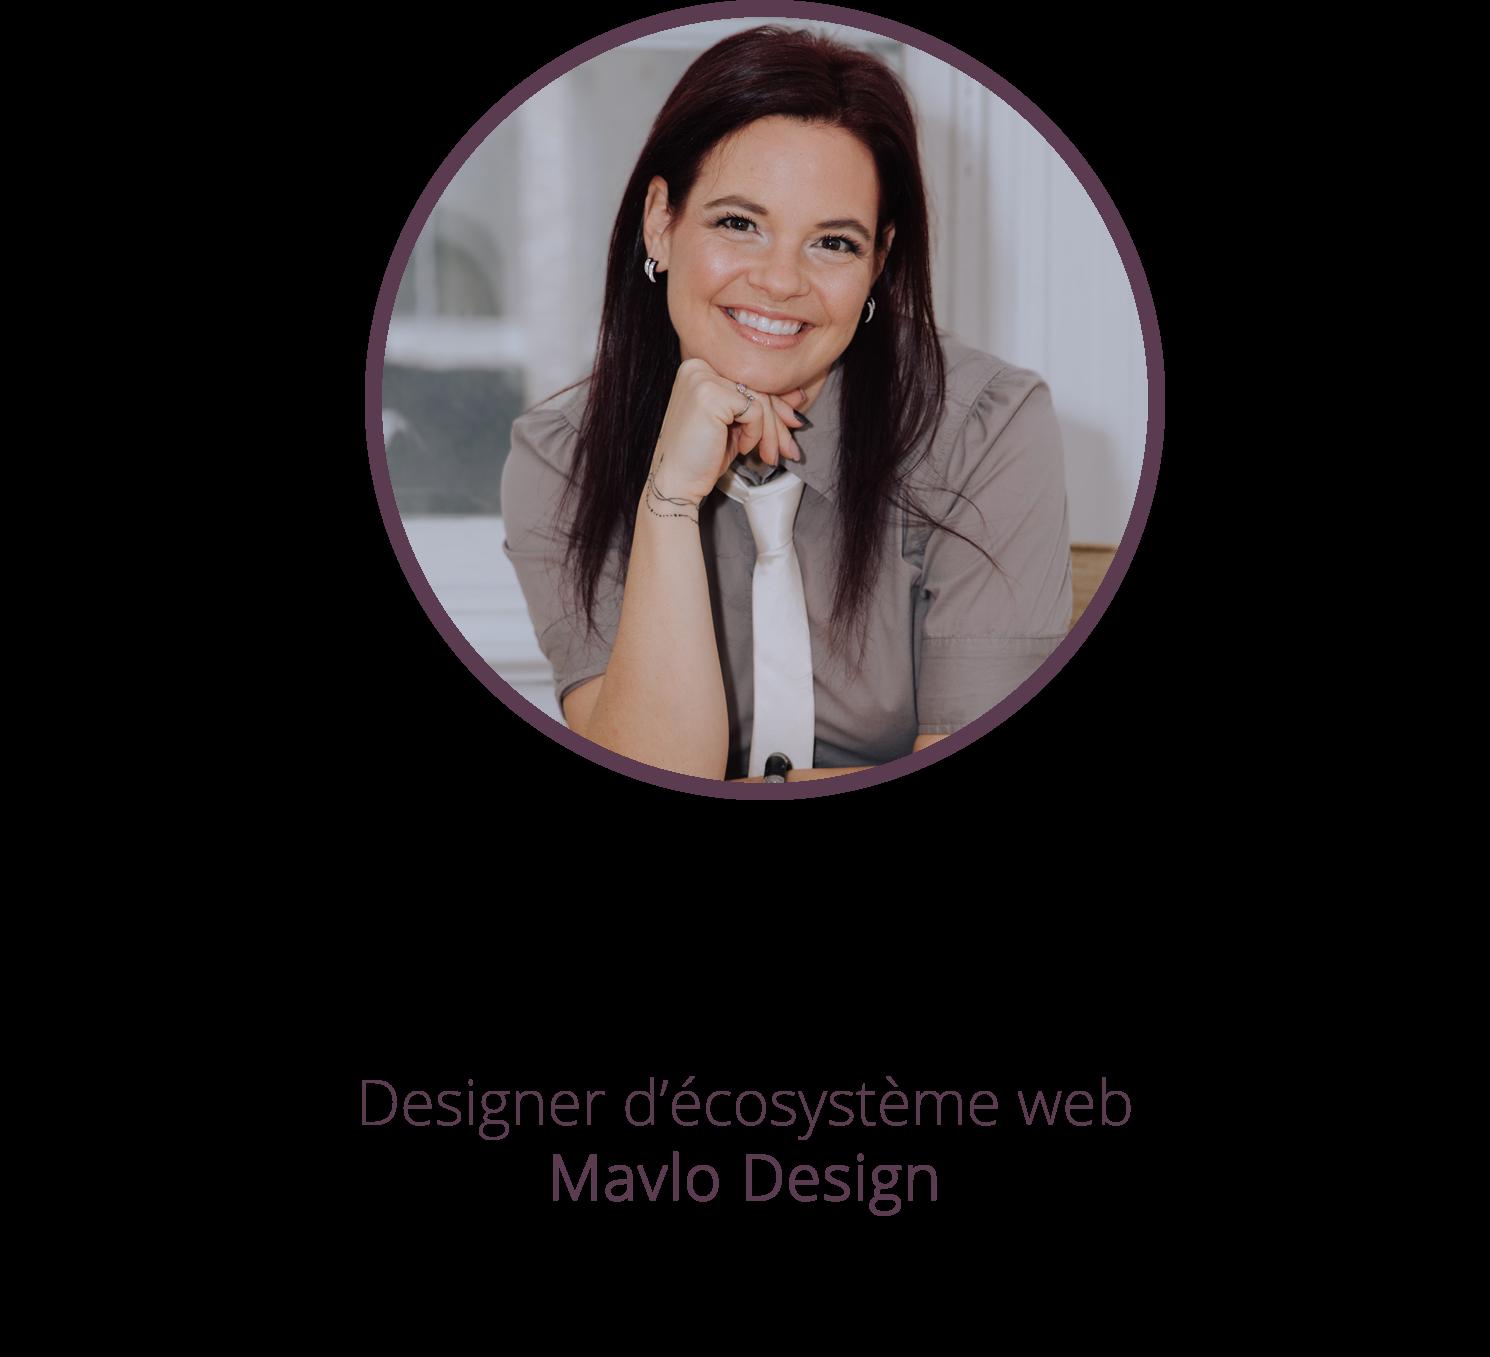 Mélodie Viens, Mavlo Design